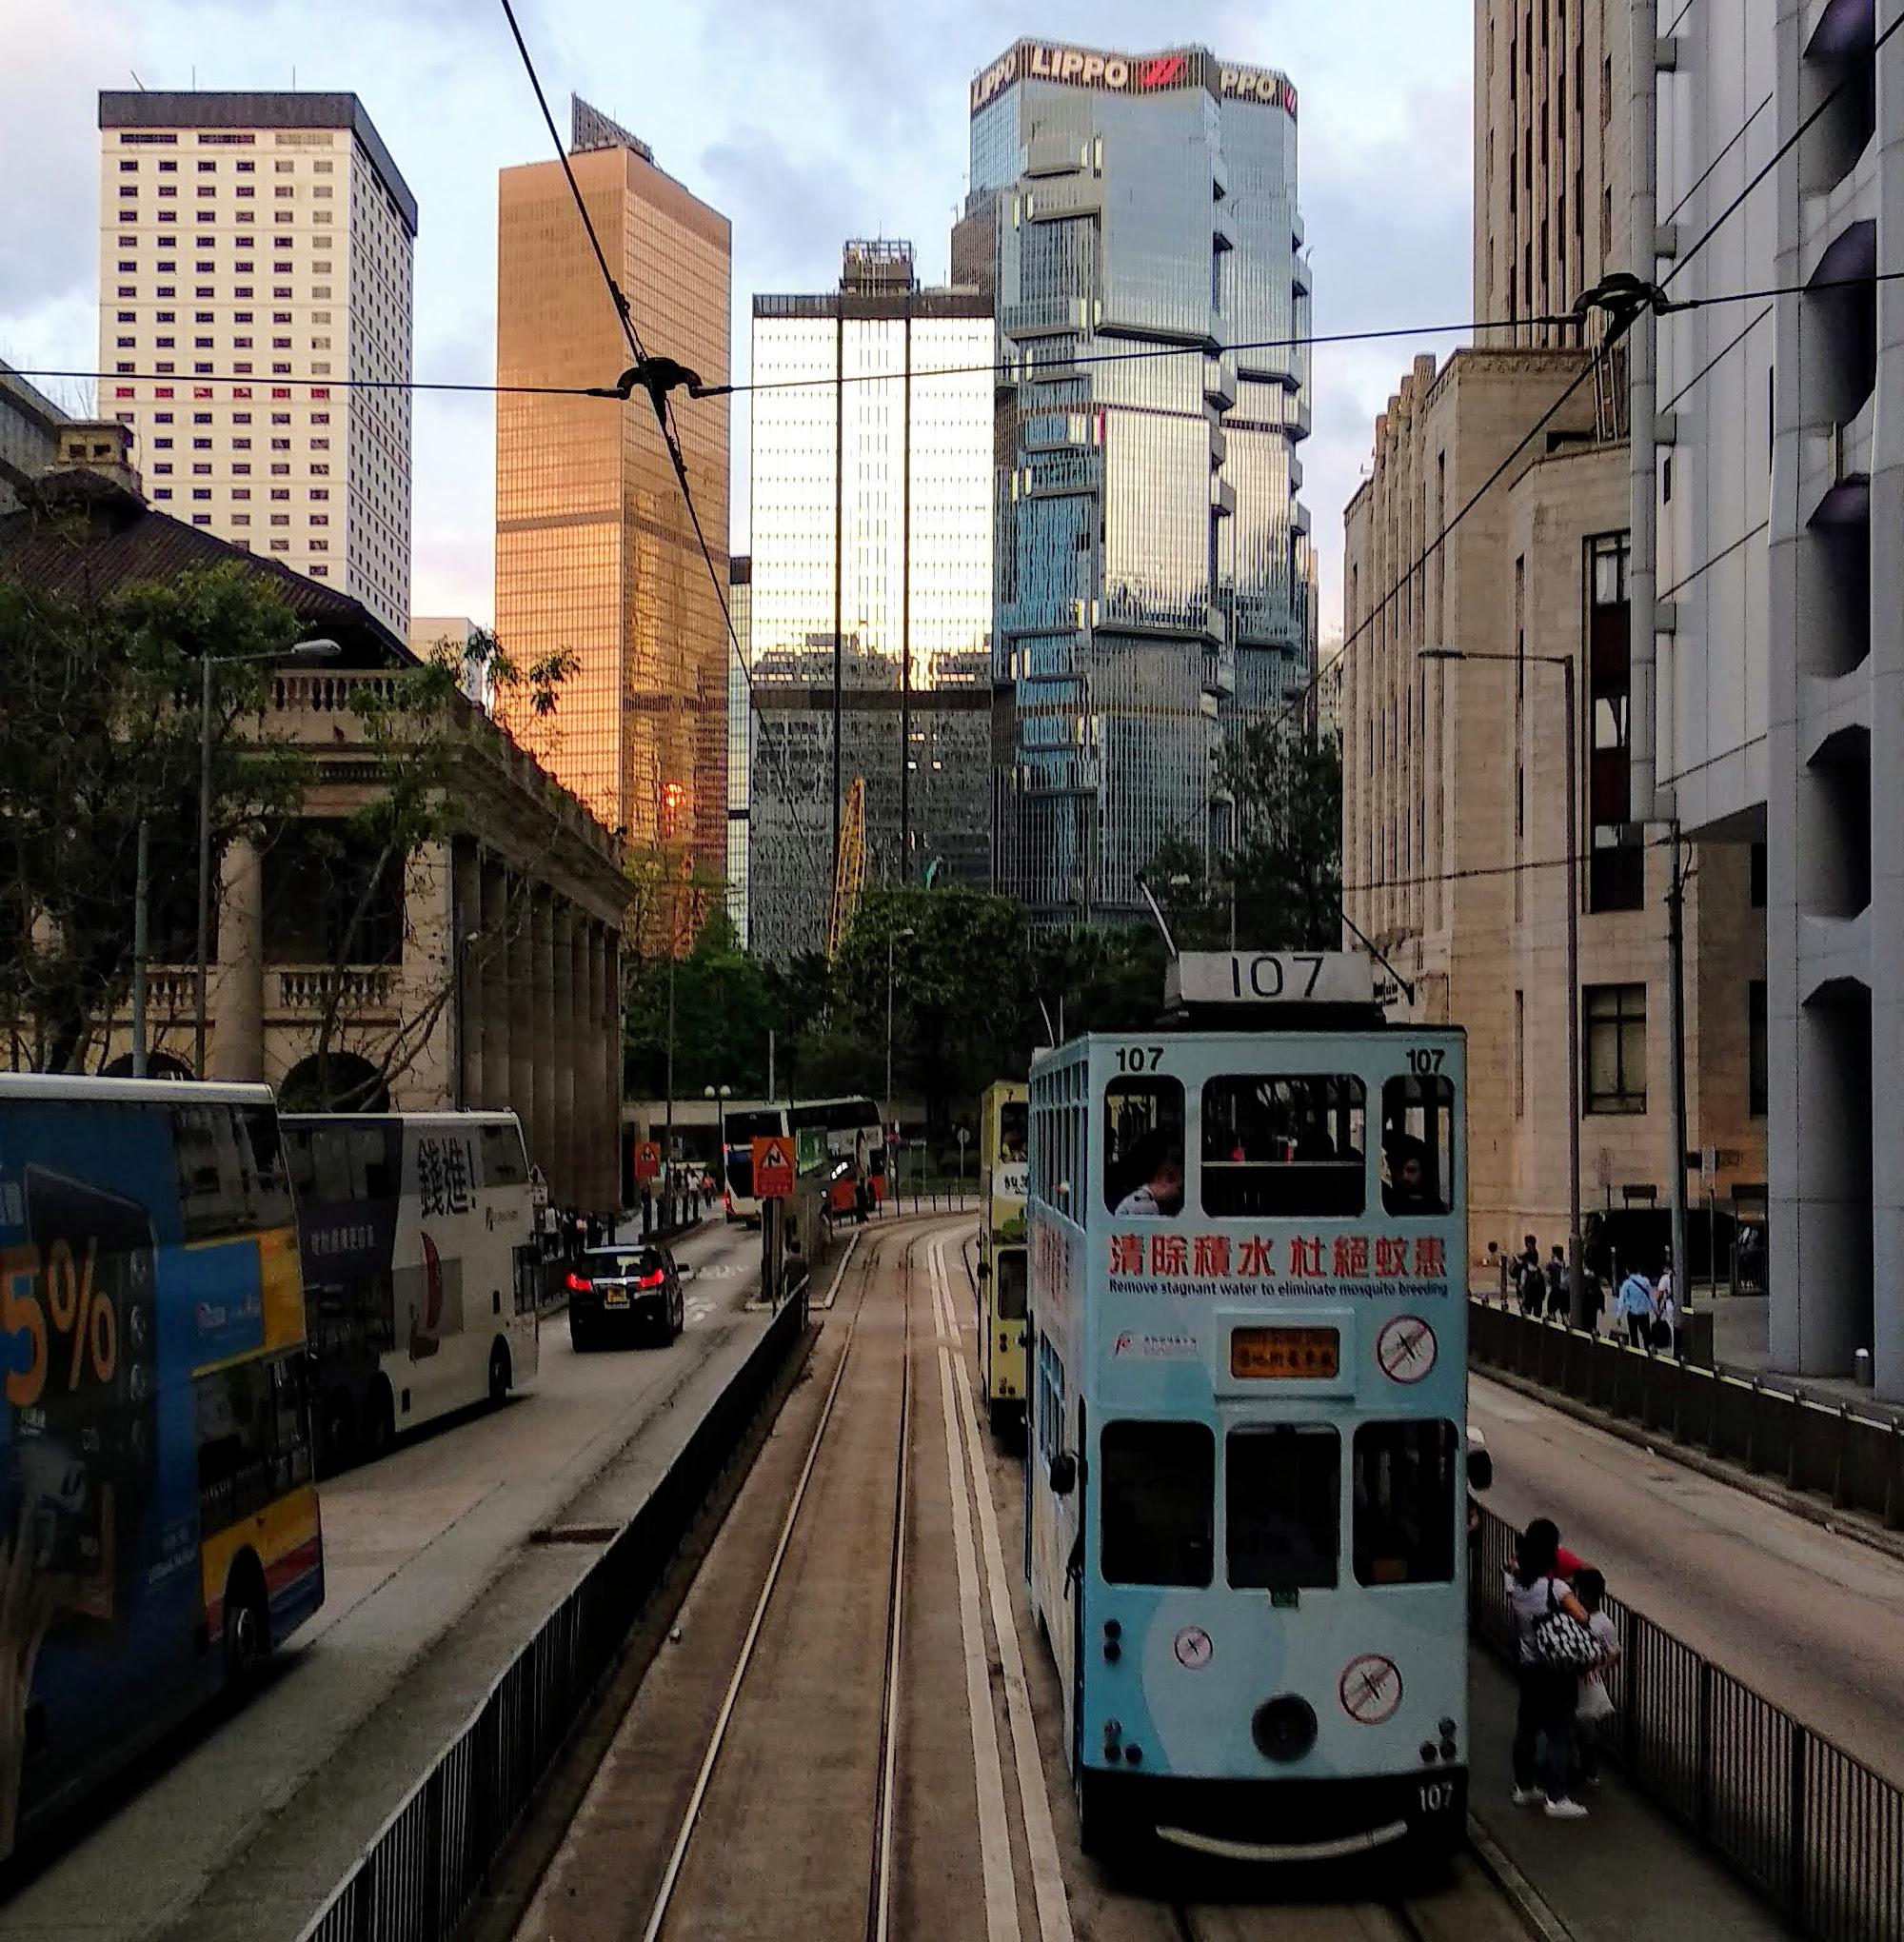 Tram in Central Hong Kong